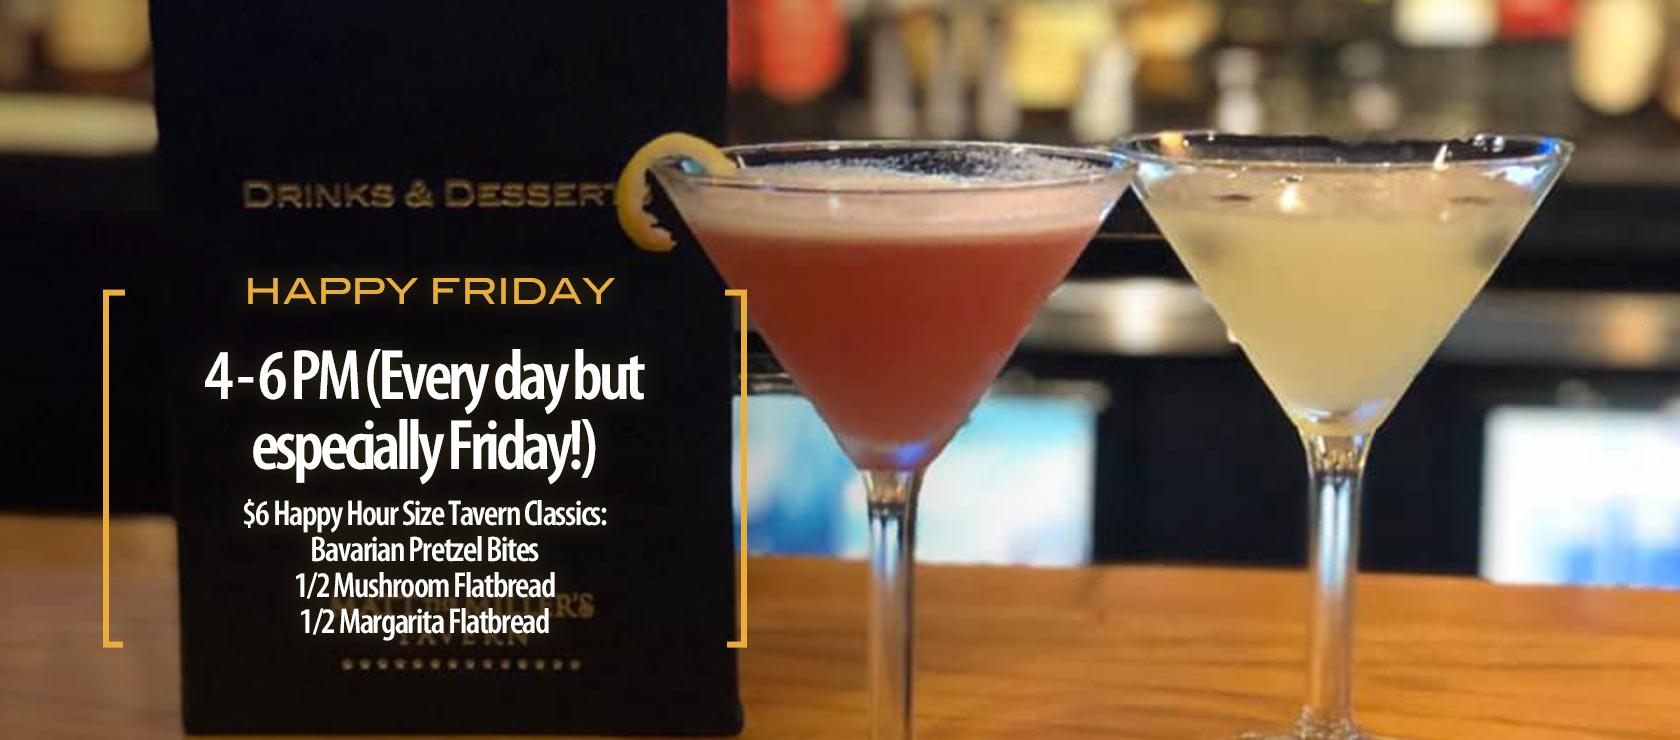 Happy Friday. 4 - 6 PM (Every day but especially Friday!) $6 Happy Hour Size Tavern Classics: Bavarian Pretzel Bites 1/2 Mushroom Flatbread 1/2 Margarita Flatbread